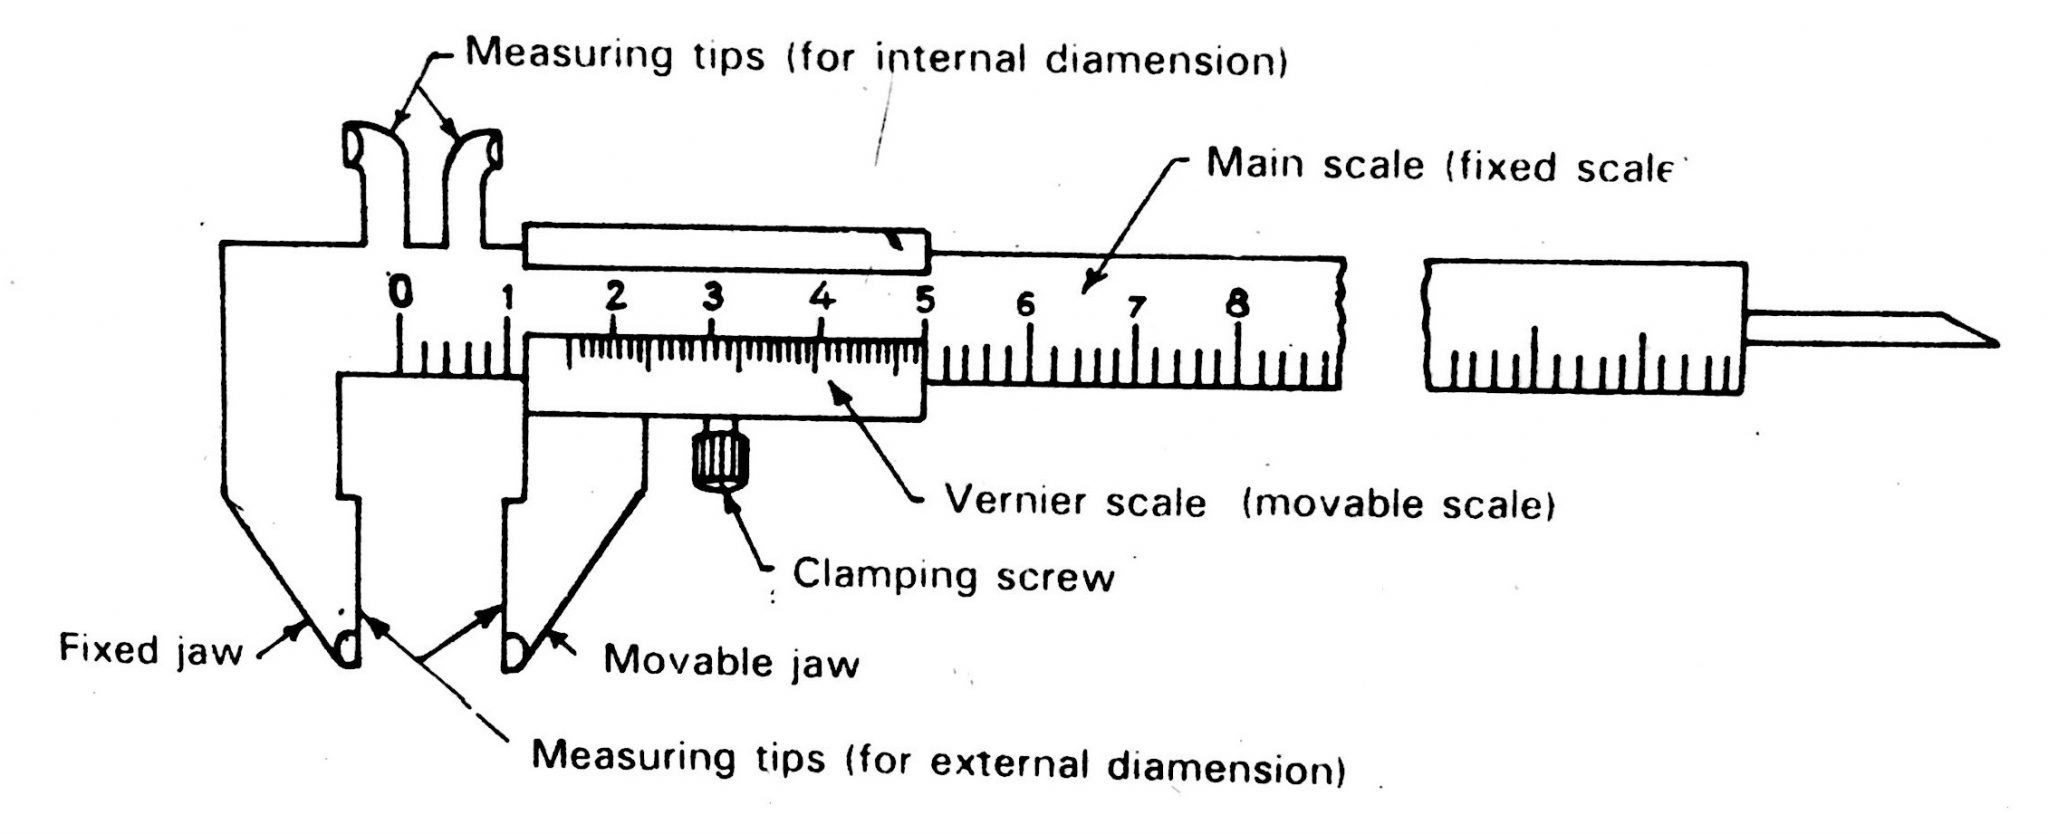 medium resolution of vernier calliper diagram working principle metrology diagram full diagram of vernier caliper full diagram of vernier caliper